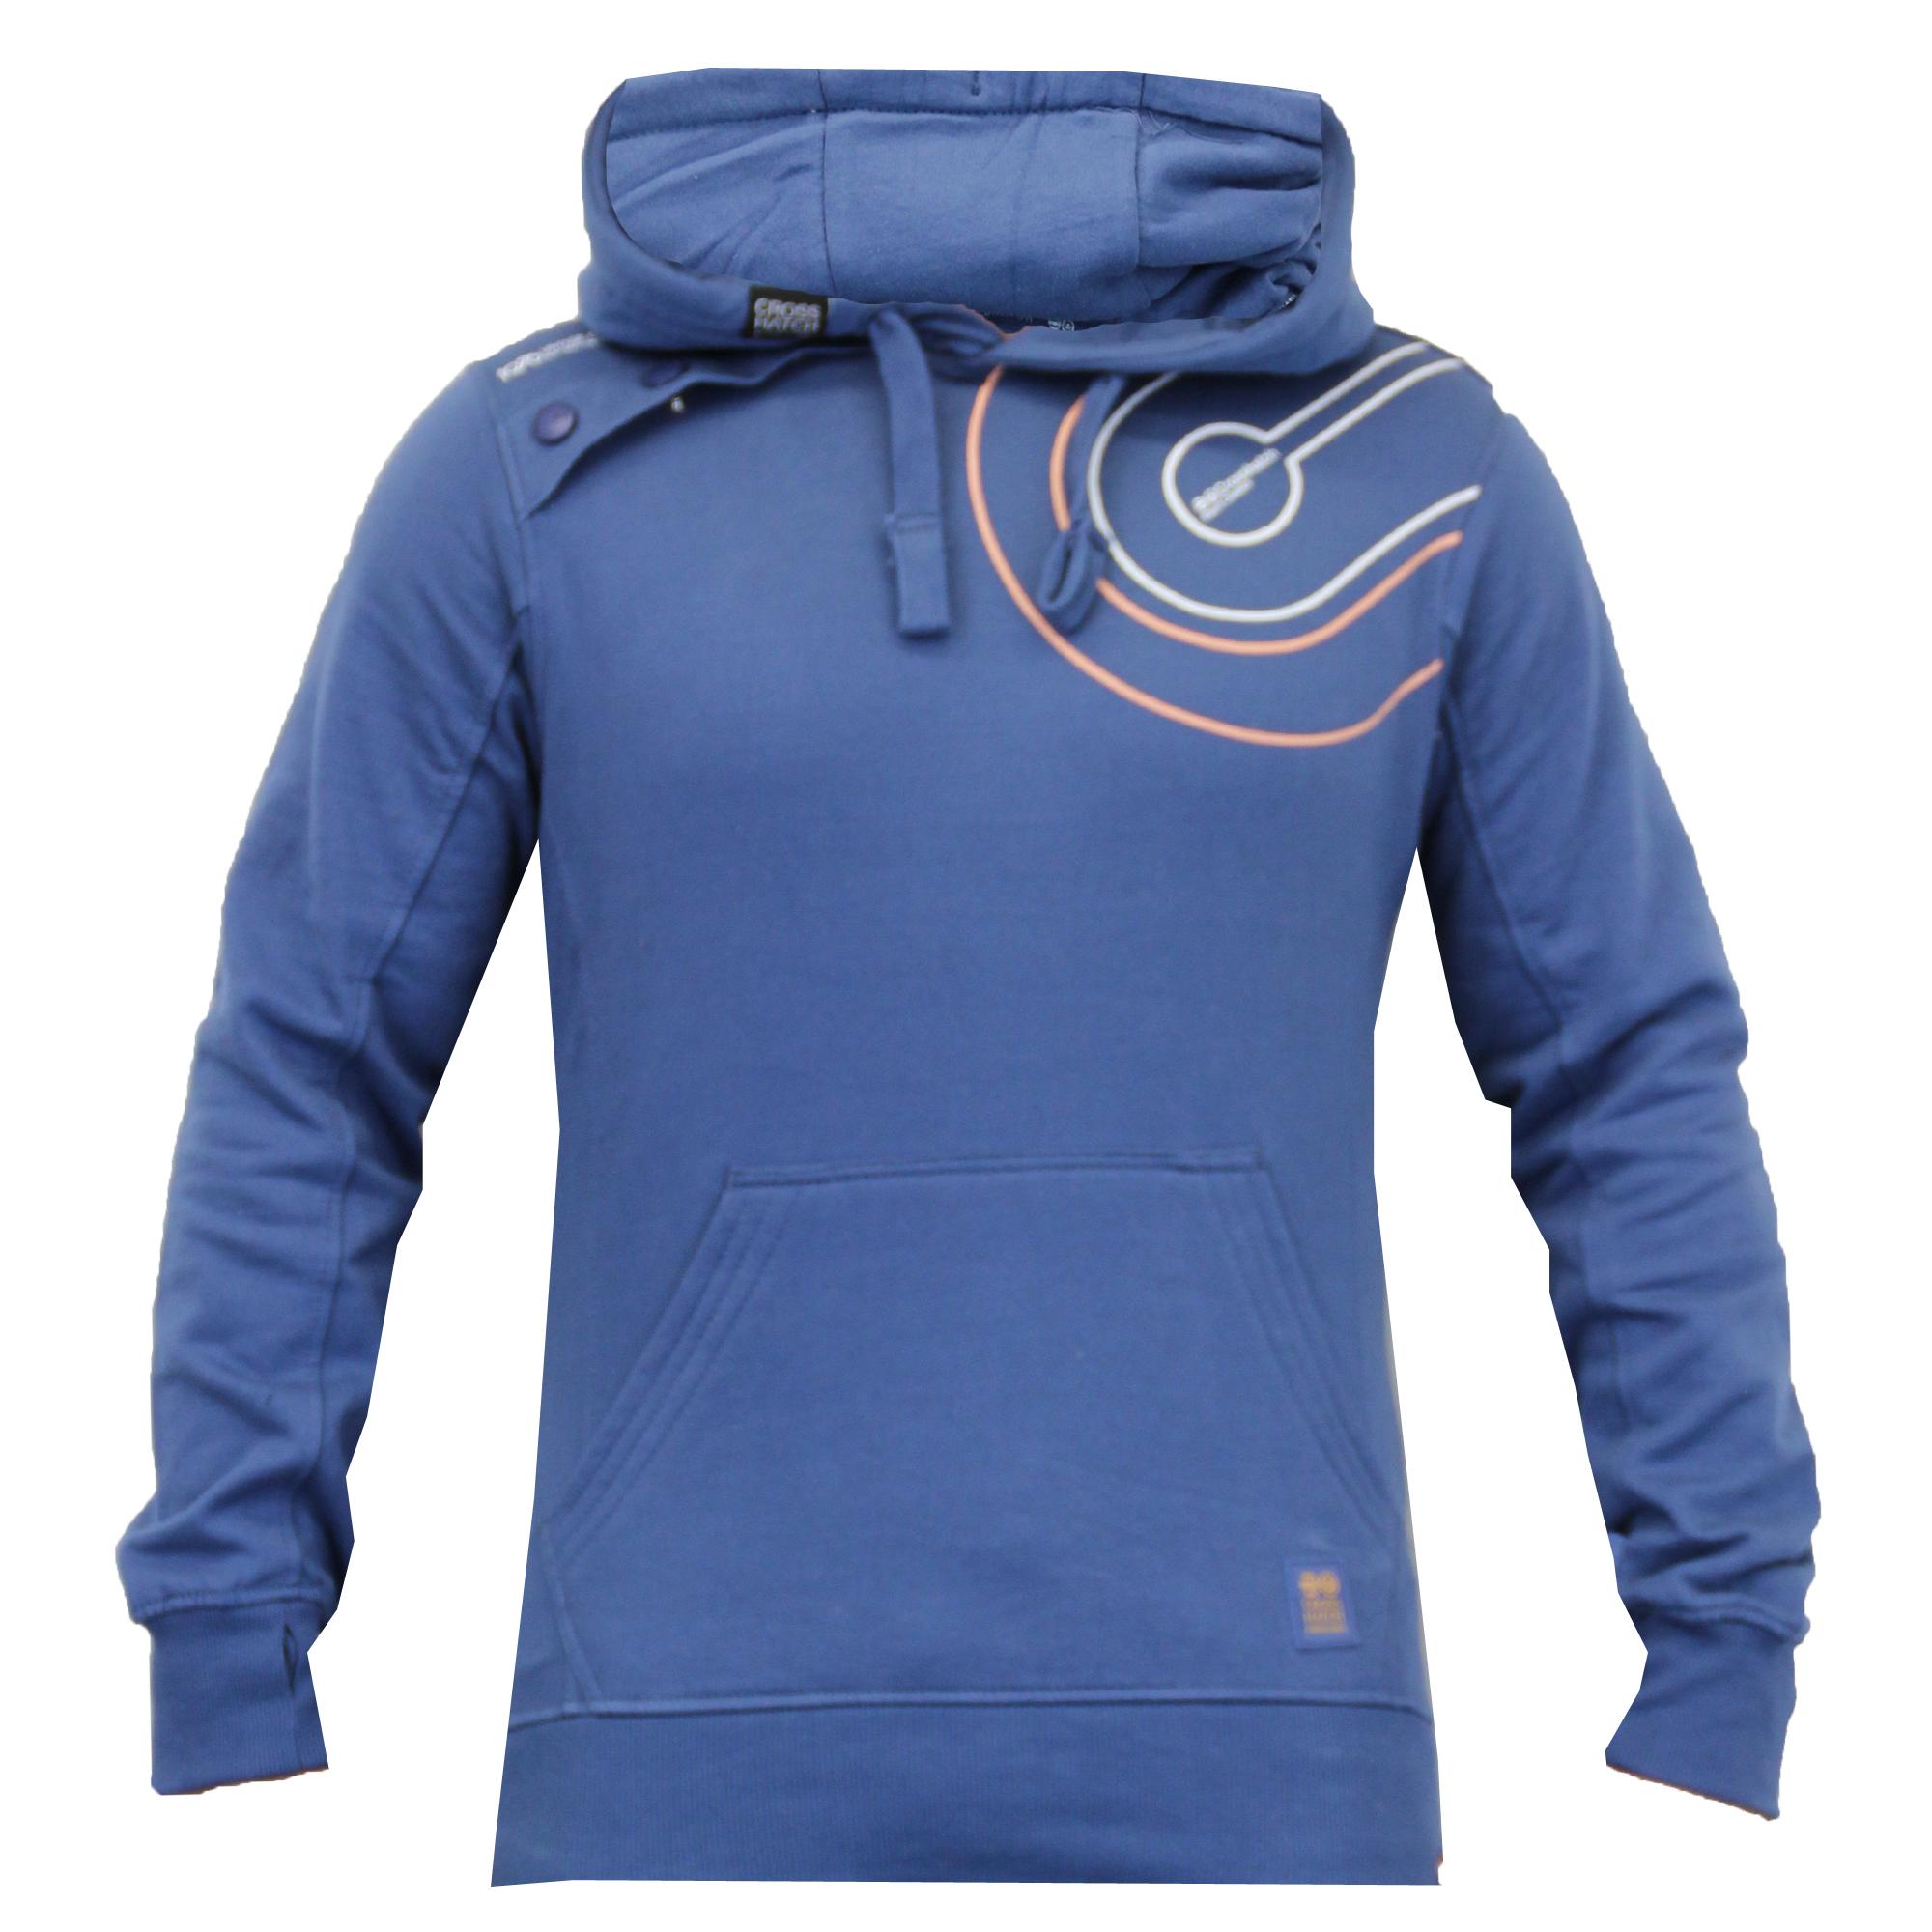 Mens-Hooded-Sweatshirt-By-Crosshatch-Fleece-Lined thumbnail 2